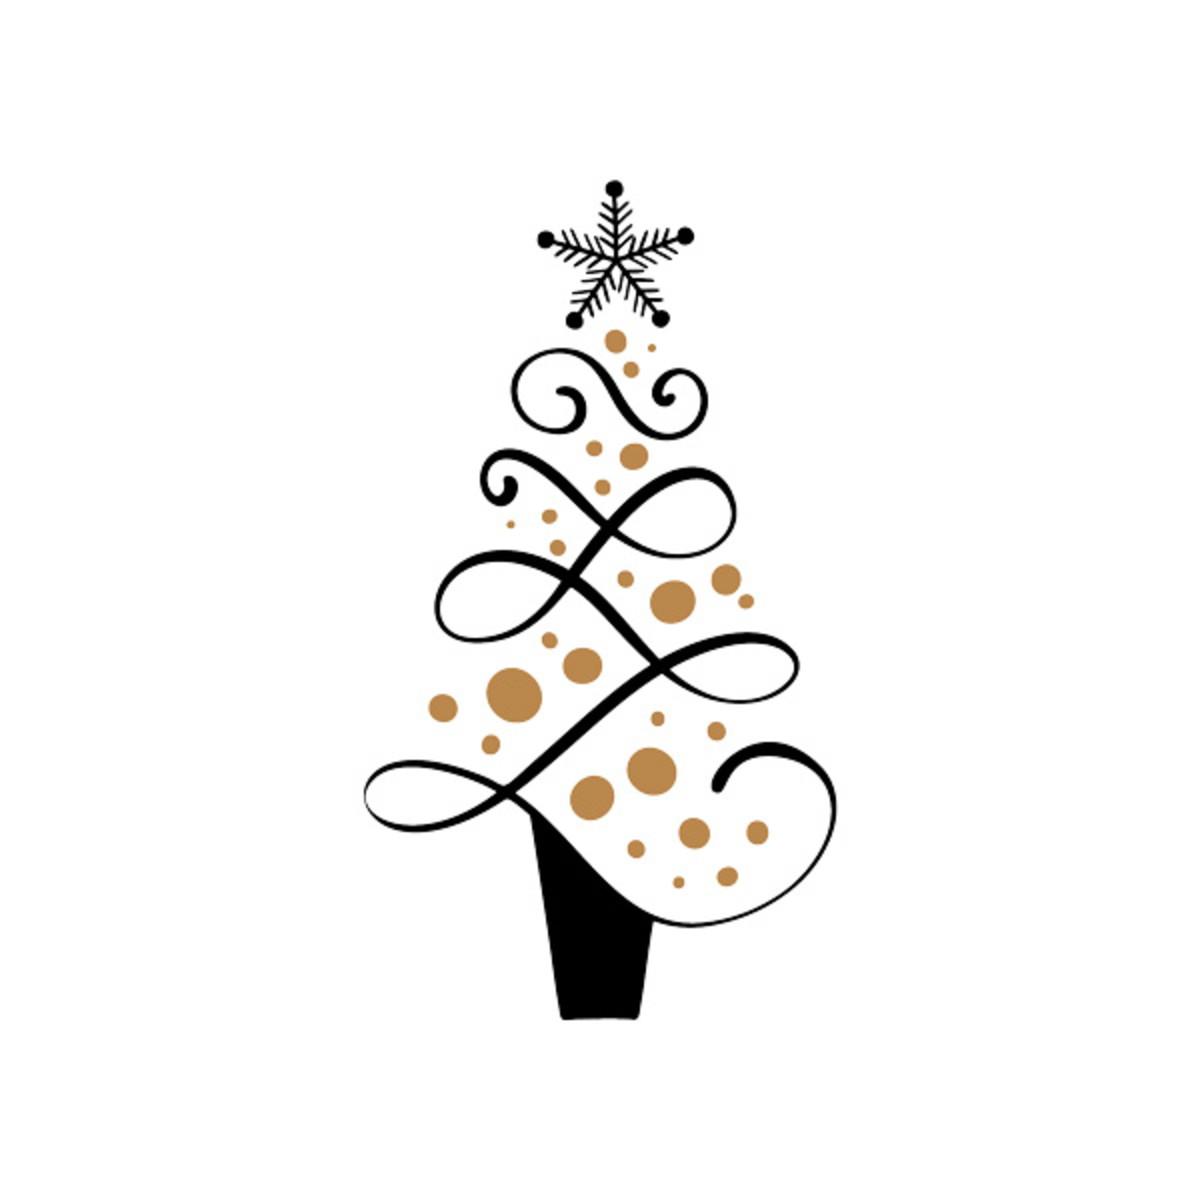 árvore De Natal Ornamento Arquivo De Corte